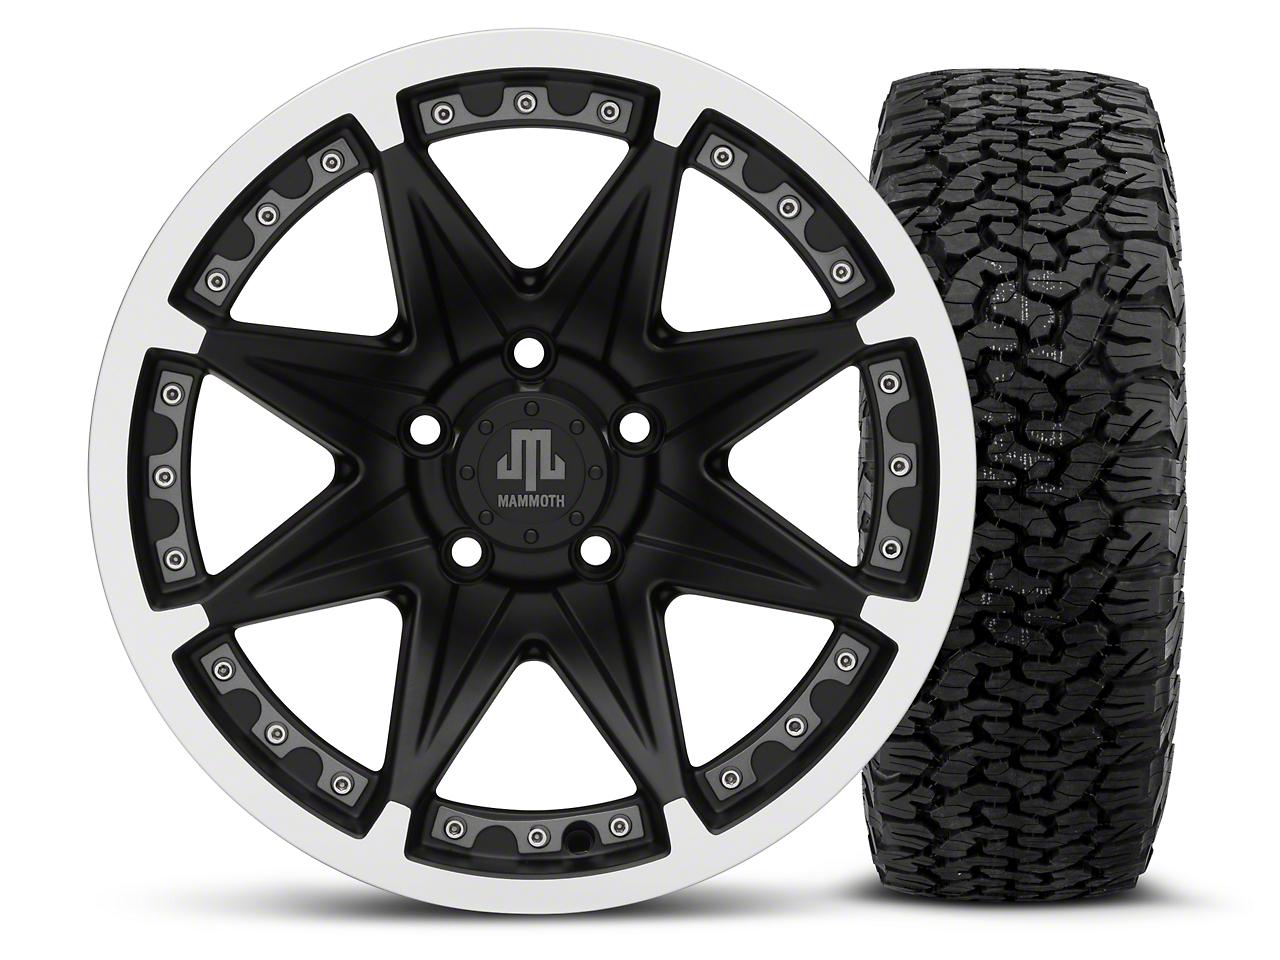 Mammoth Type 88 Black 16x8 Wheel & Dick Cepek Fun Country 315/75R16 Tire Kit (87-06 Jeep Wrangler YJ & TJ)